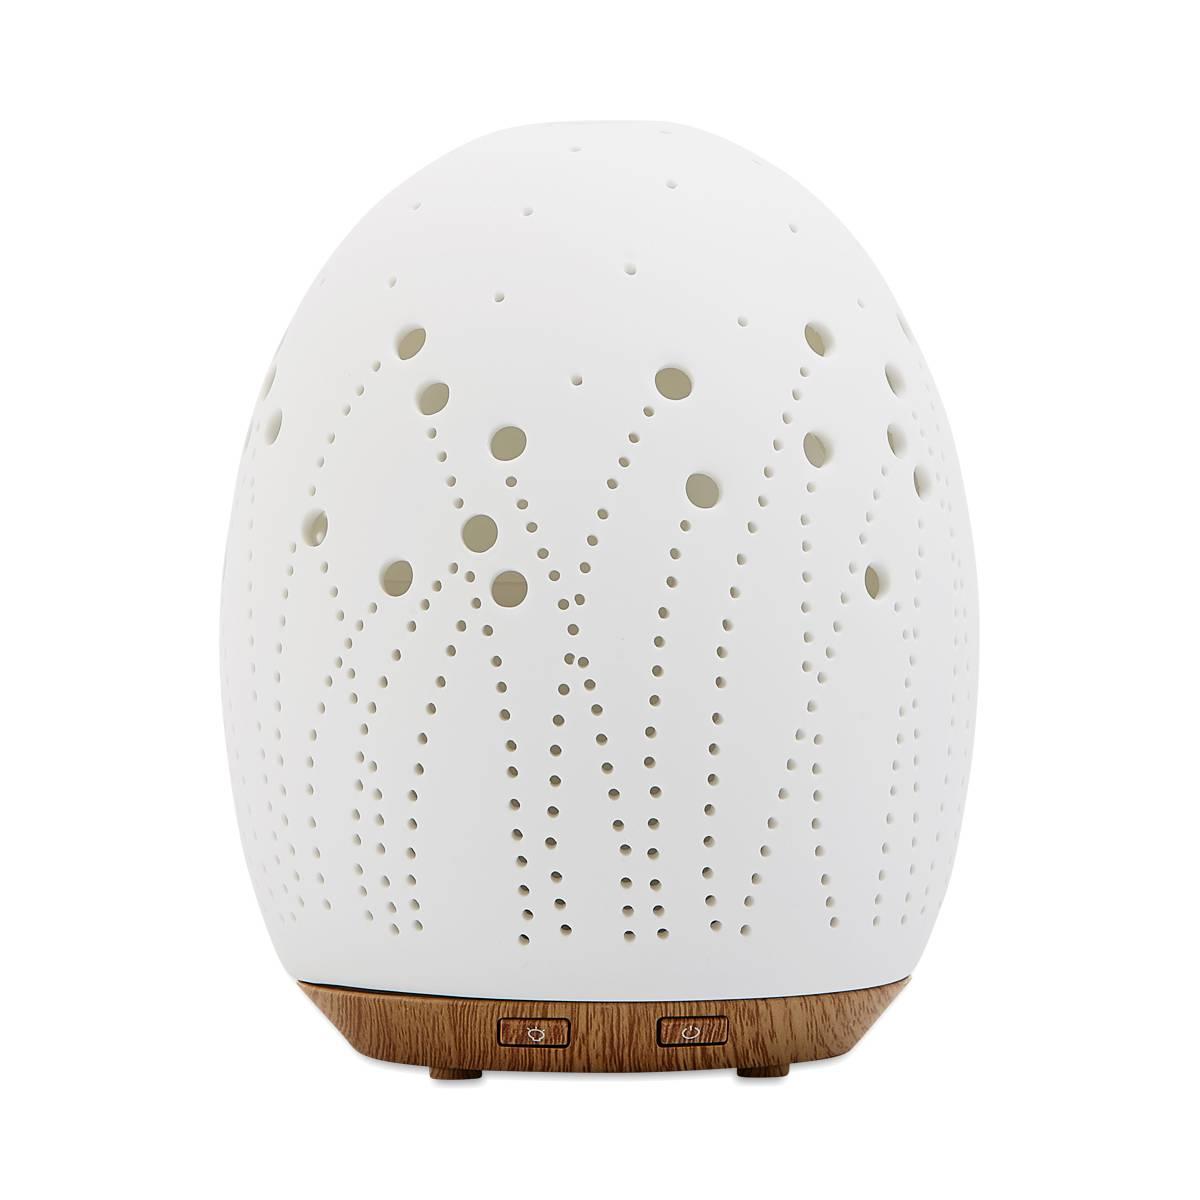 Greenair Meadow Ceramic Diffuser Thrive Market